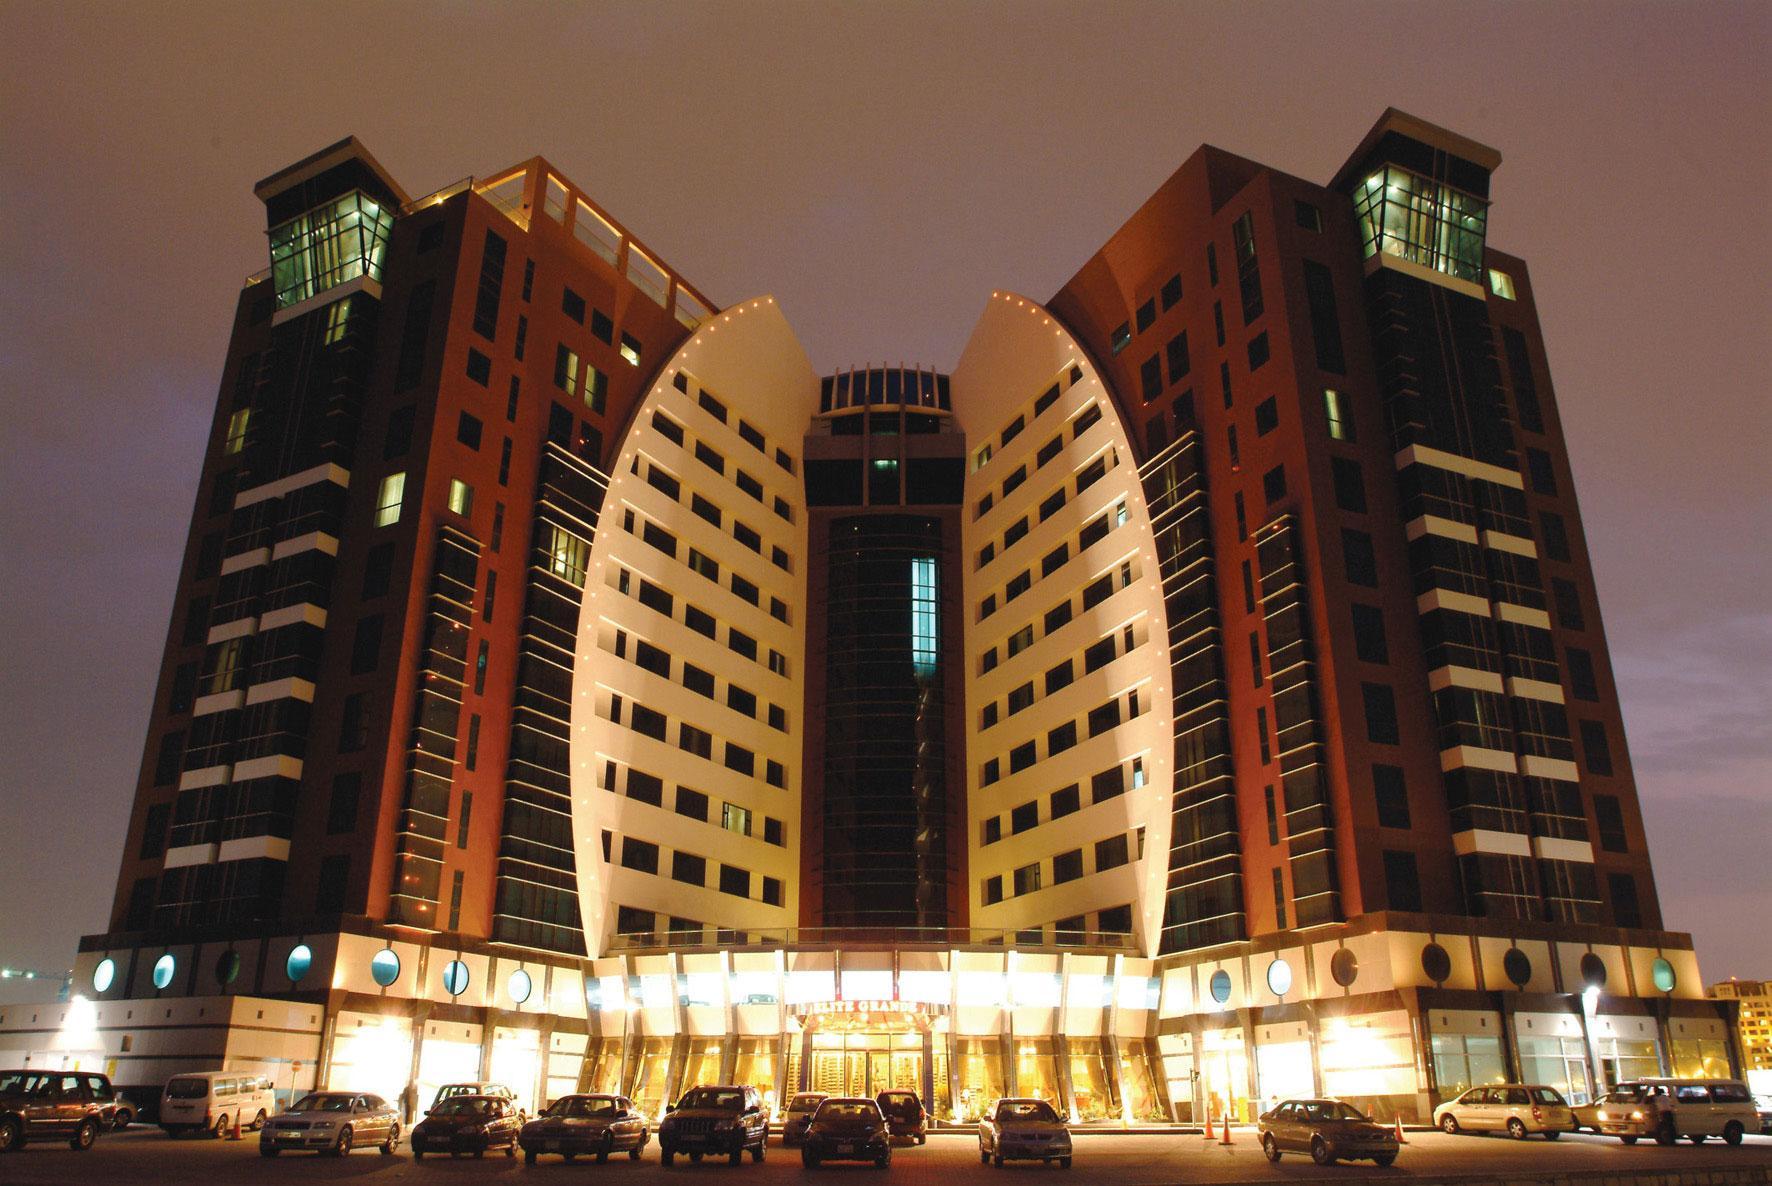 elite grande hotel aed 377 a e d 4 5 6 manama hotel deals rh kayak ae